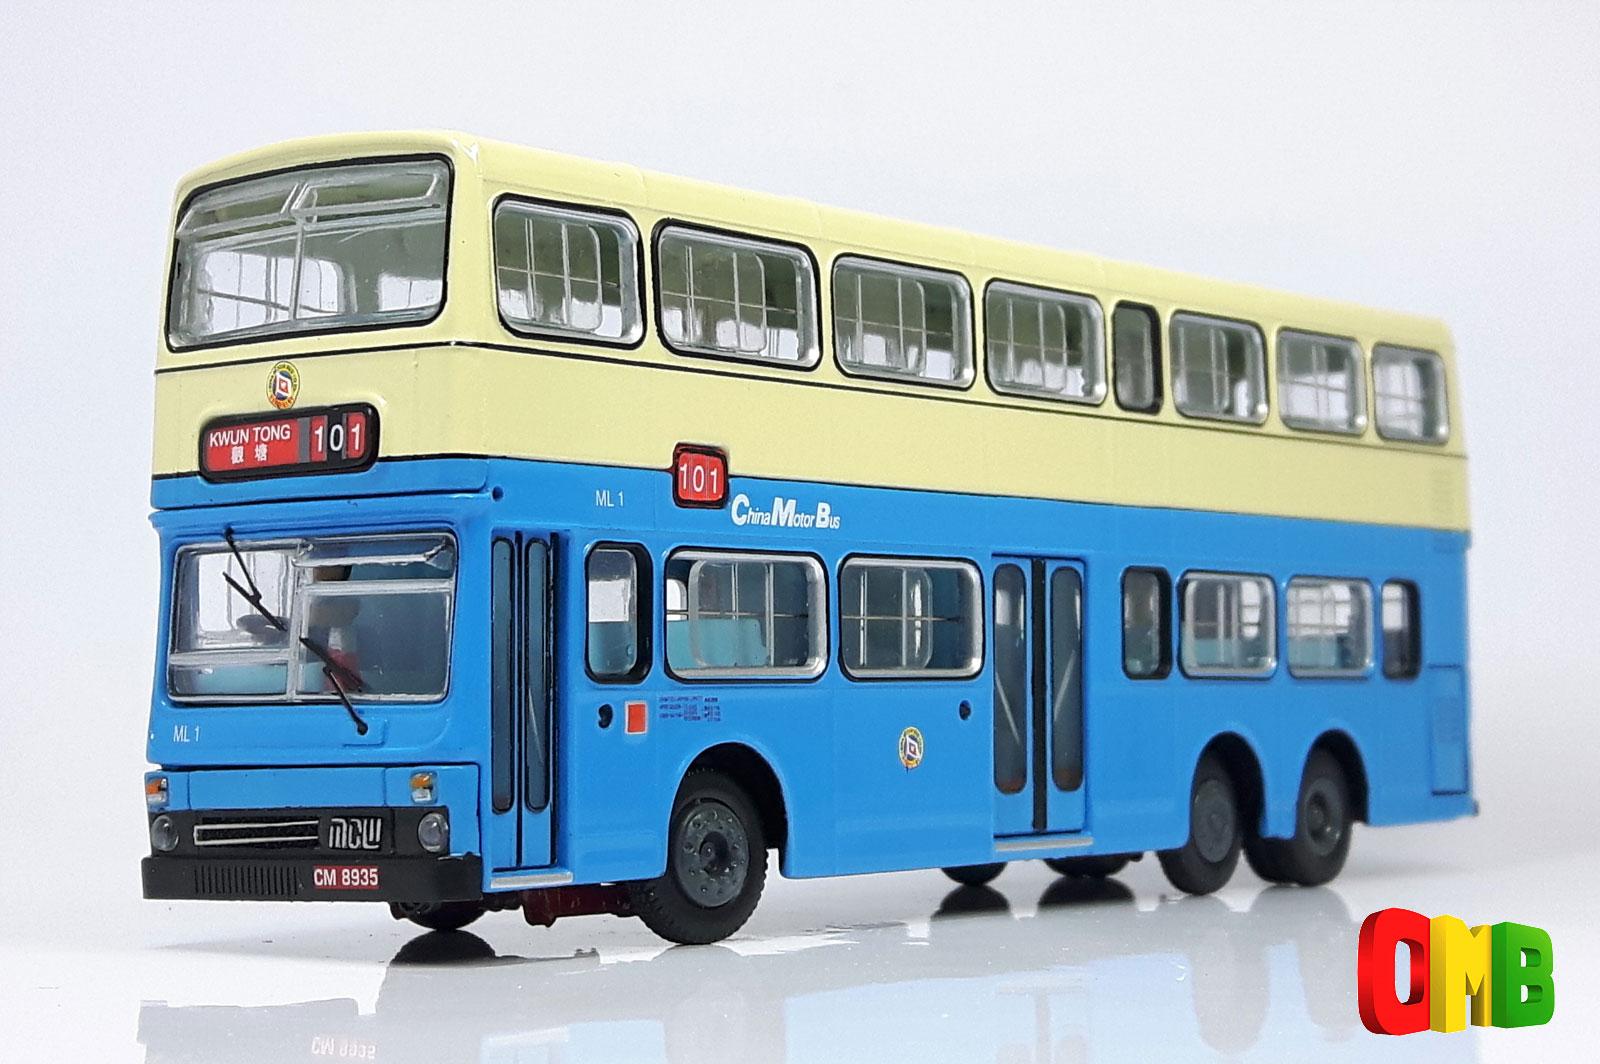 000803 Abc Models Mcw Metrobus China Motor Bus